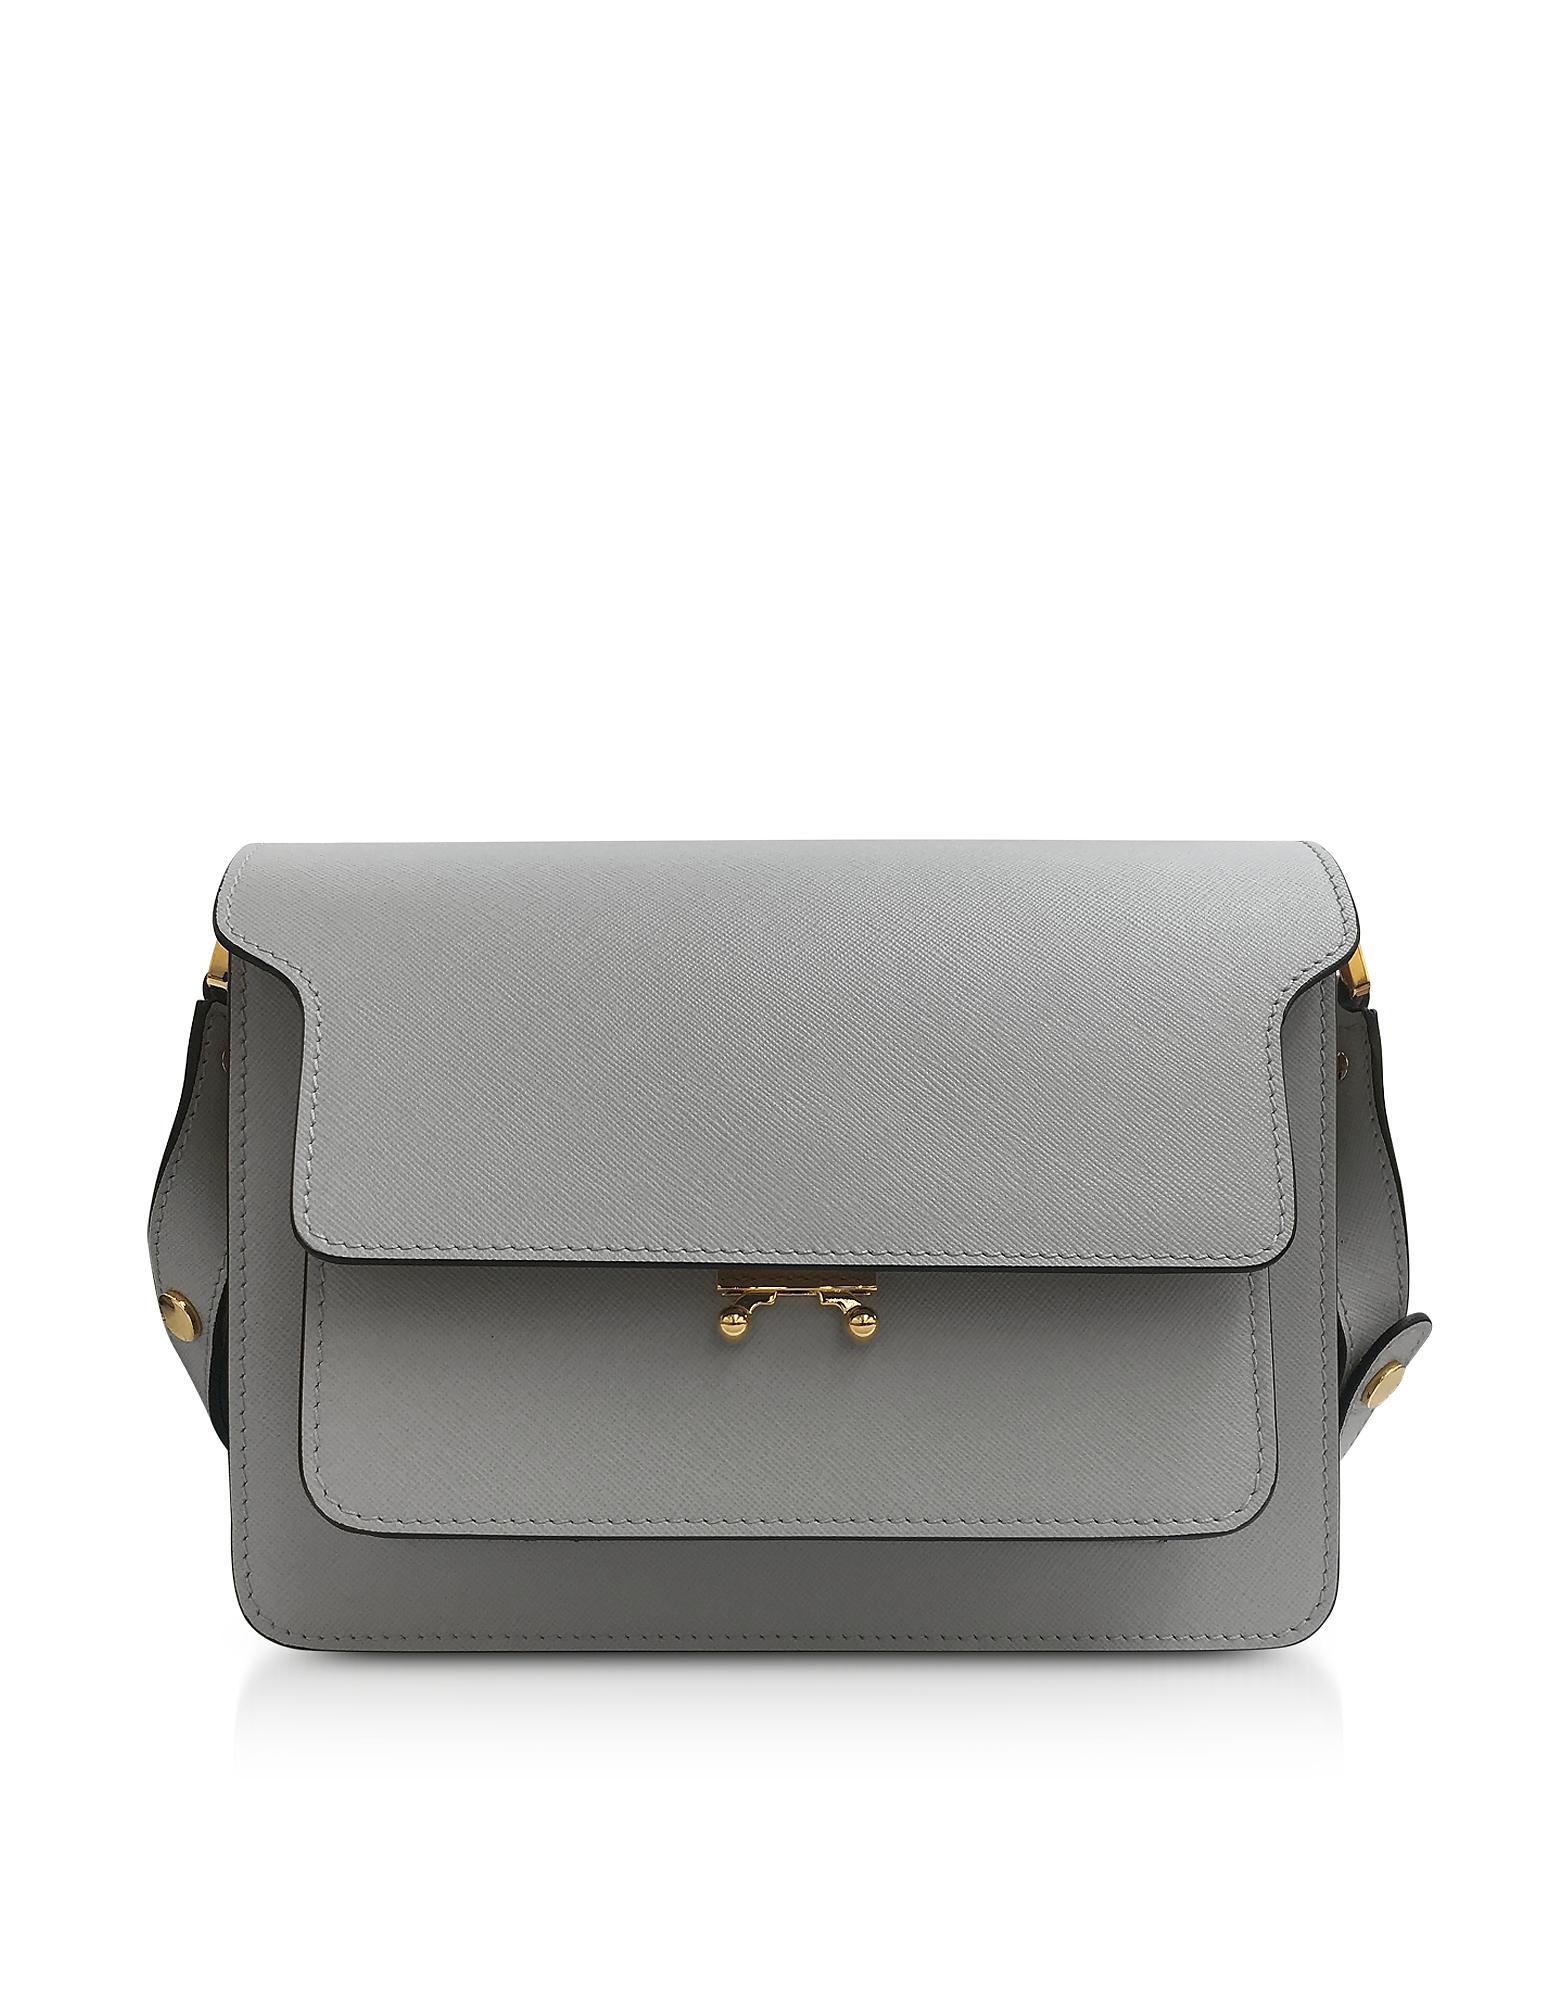 Marni Handbags, Pelican Saffiano Leather Trunk Bag